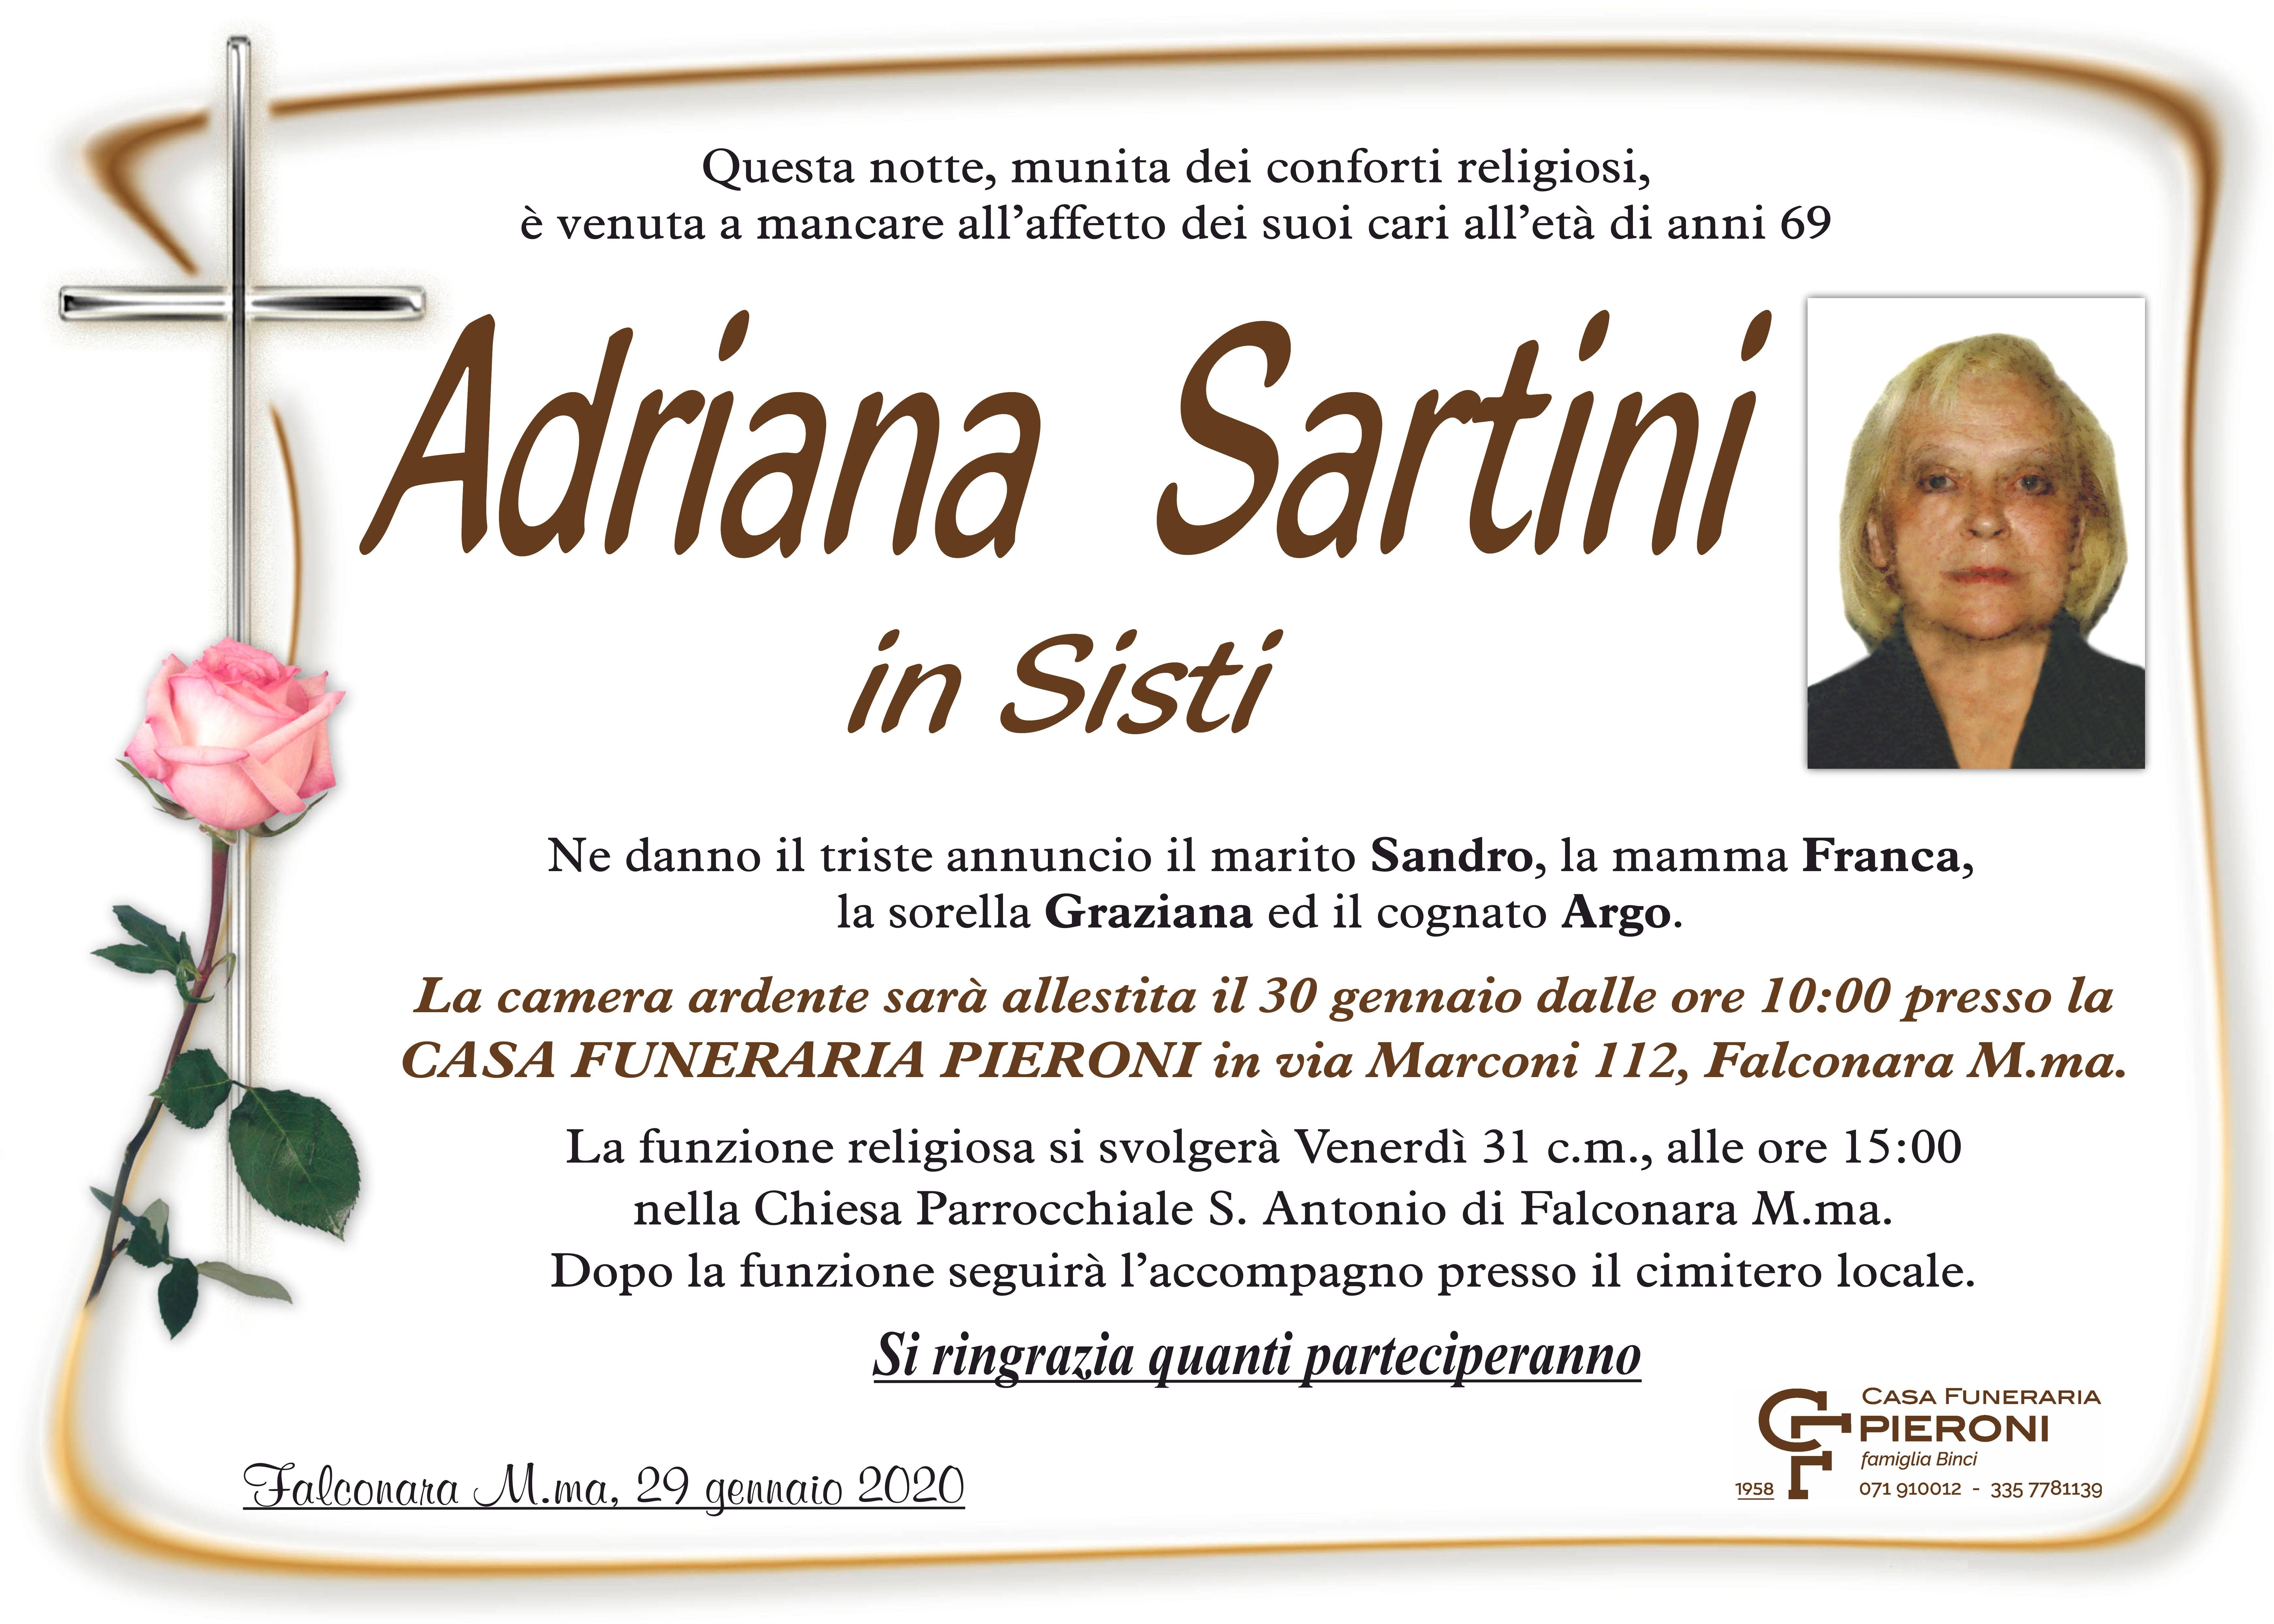 Adriana Sartini